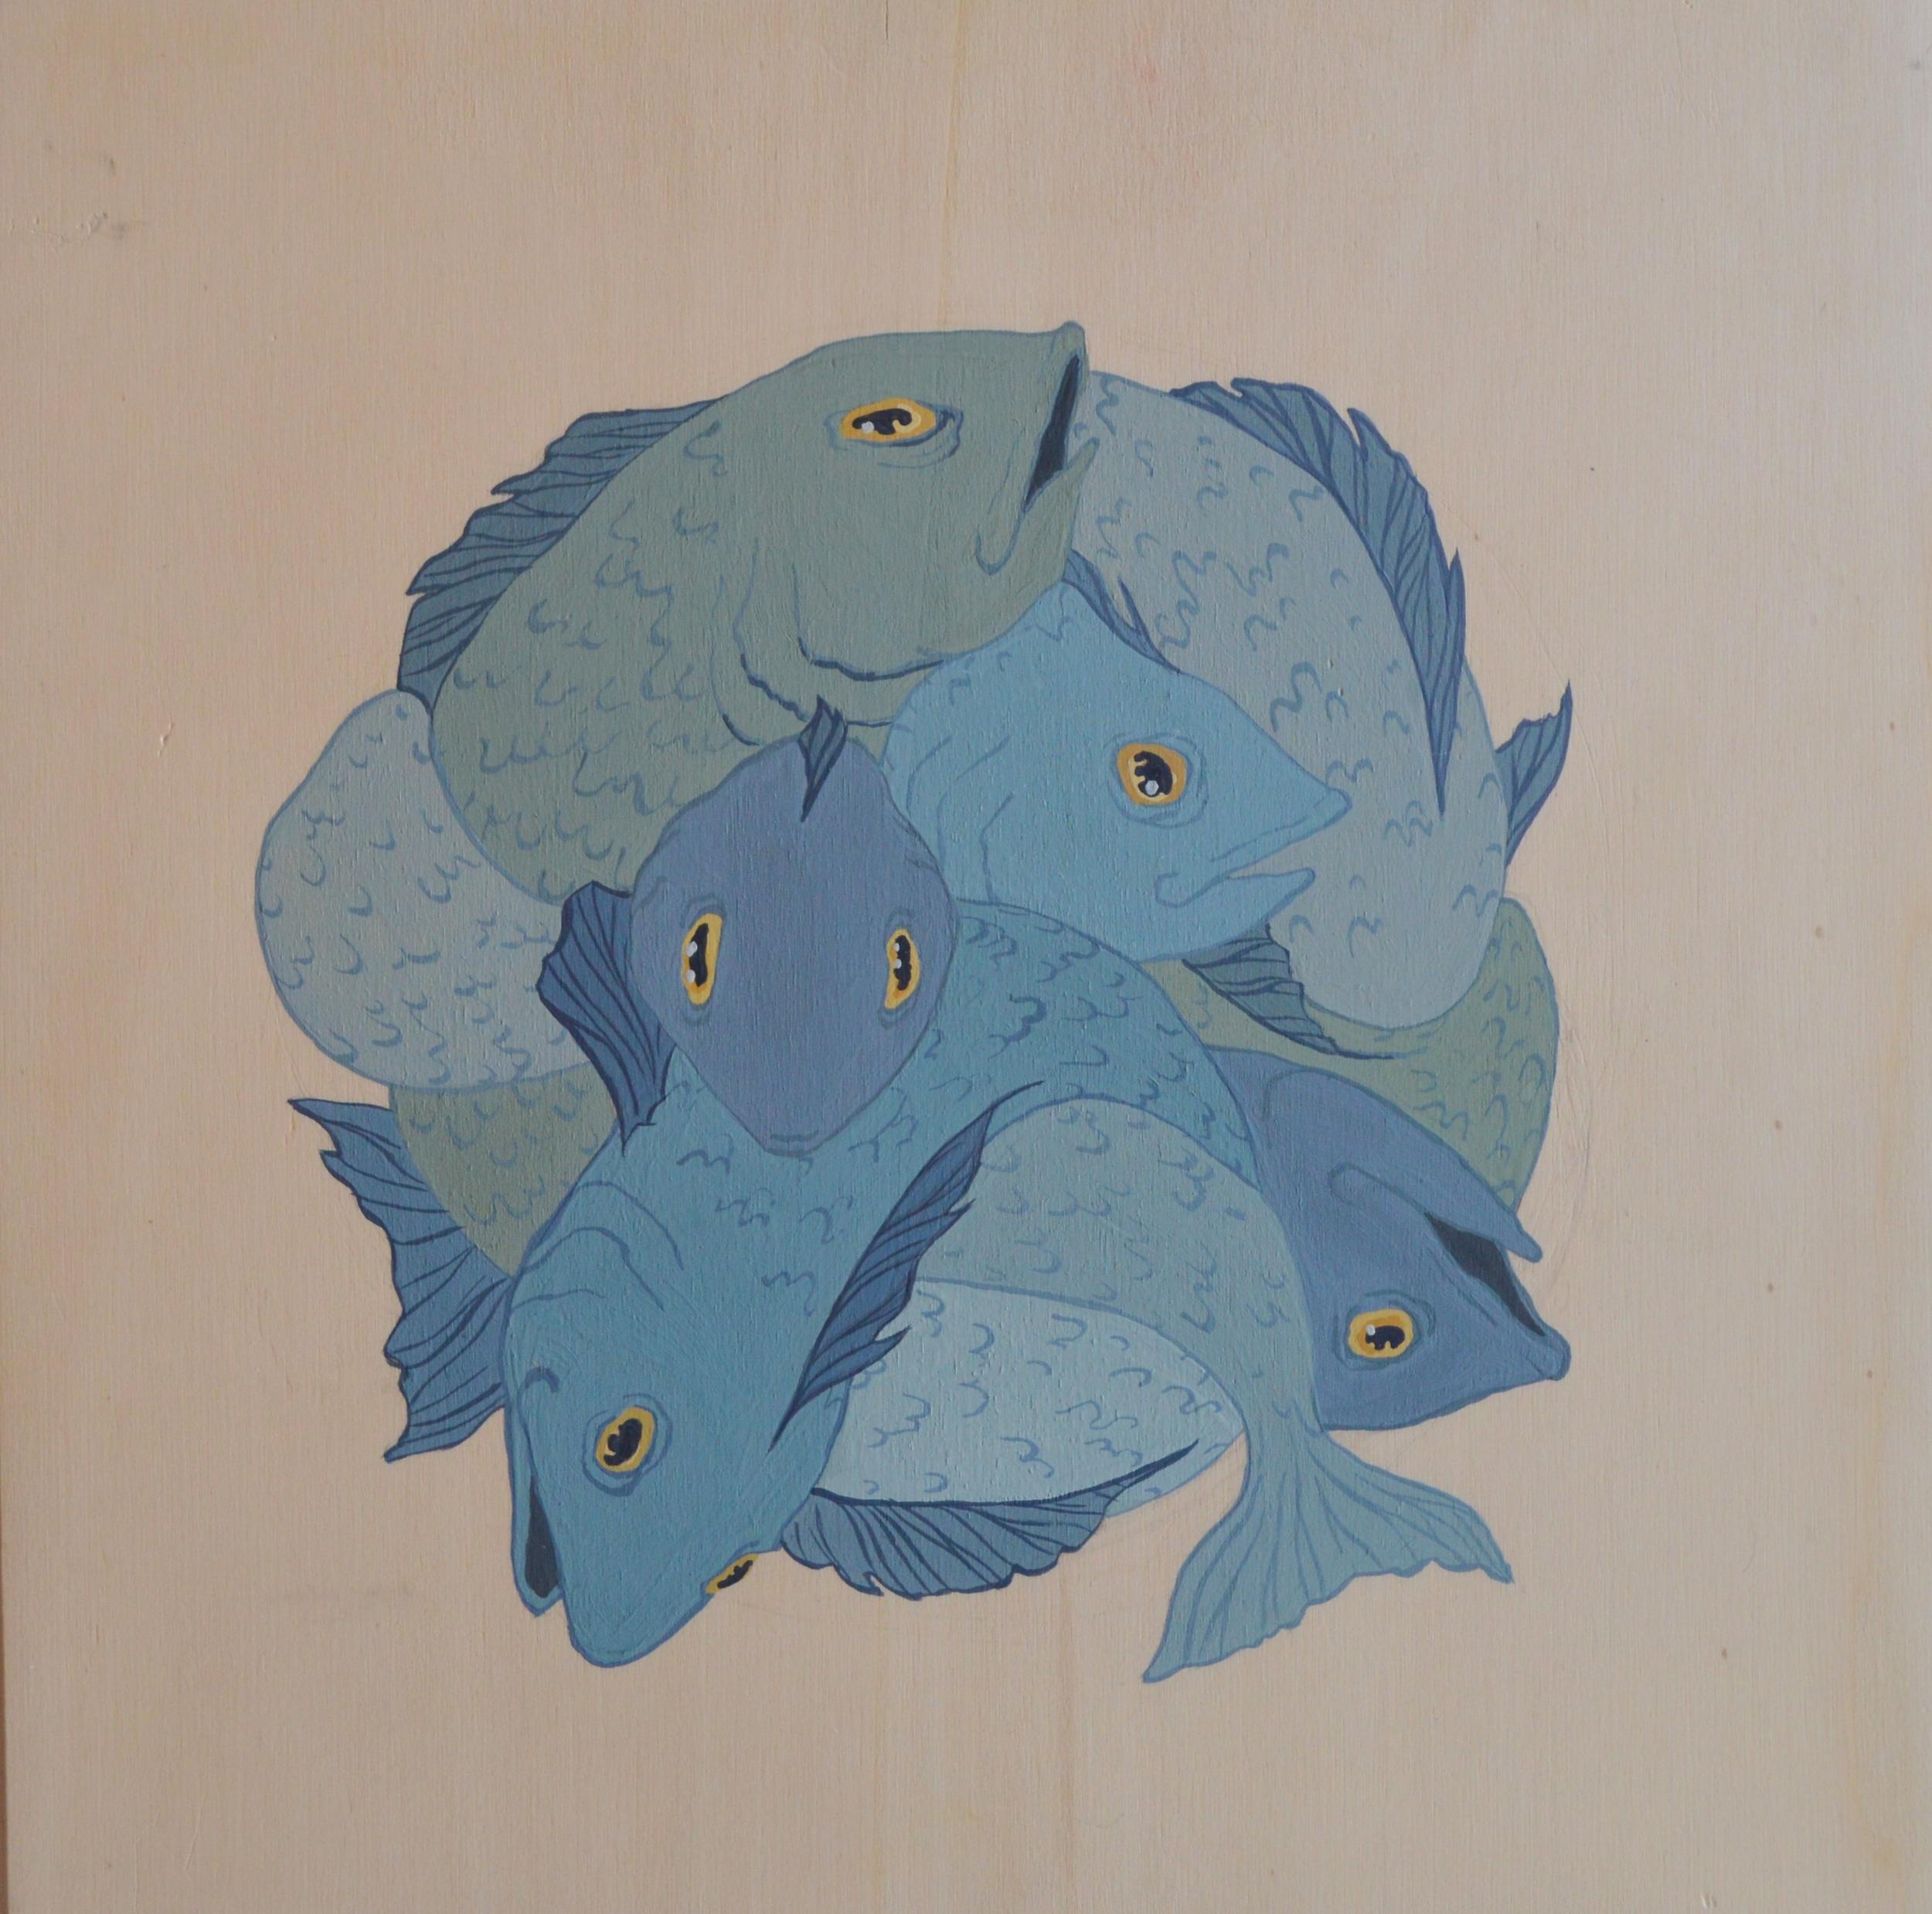 Fish ,30 x 30 cm, gouache on wood, 2013